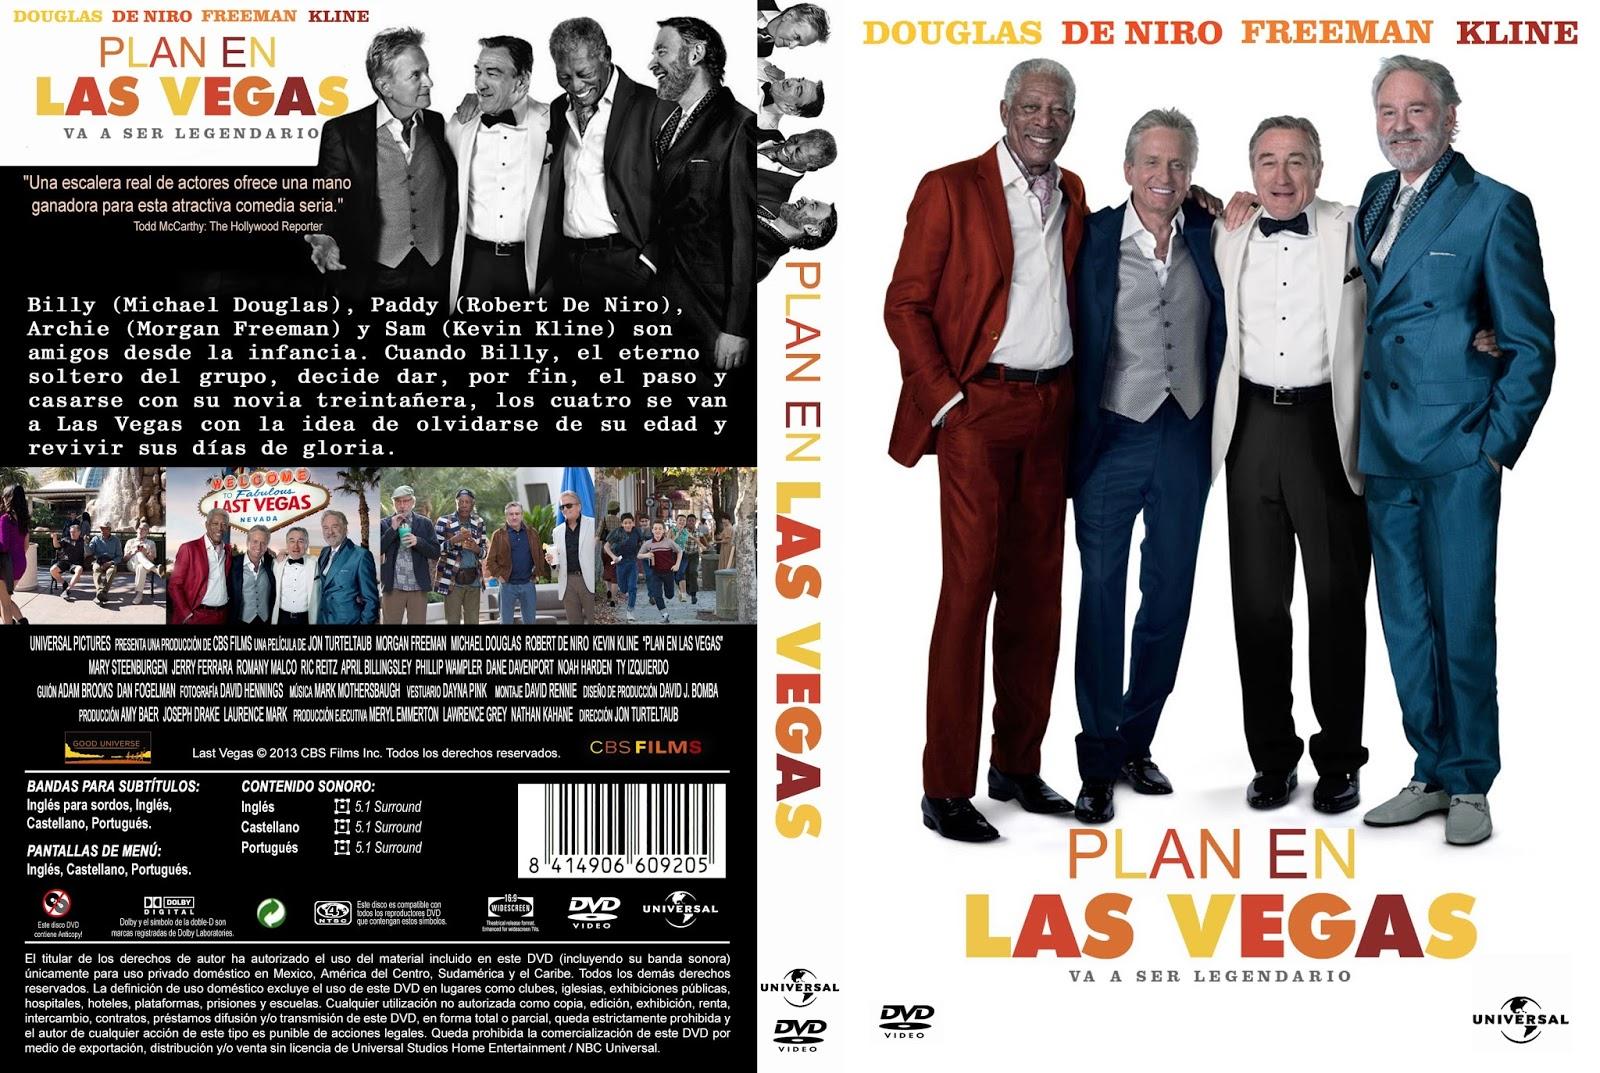 last vegas cover - photo #10